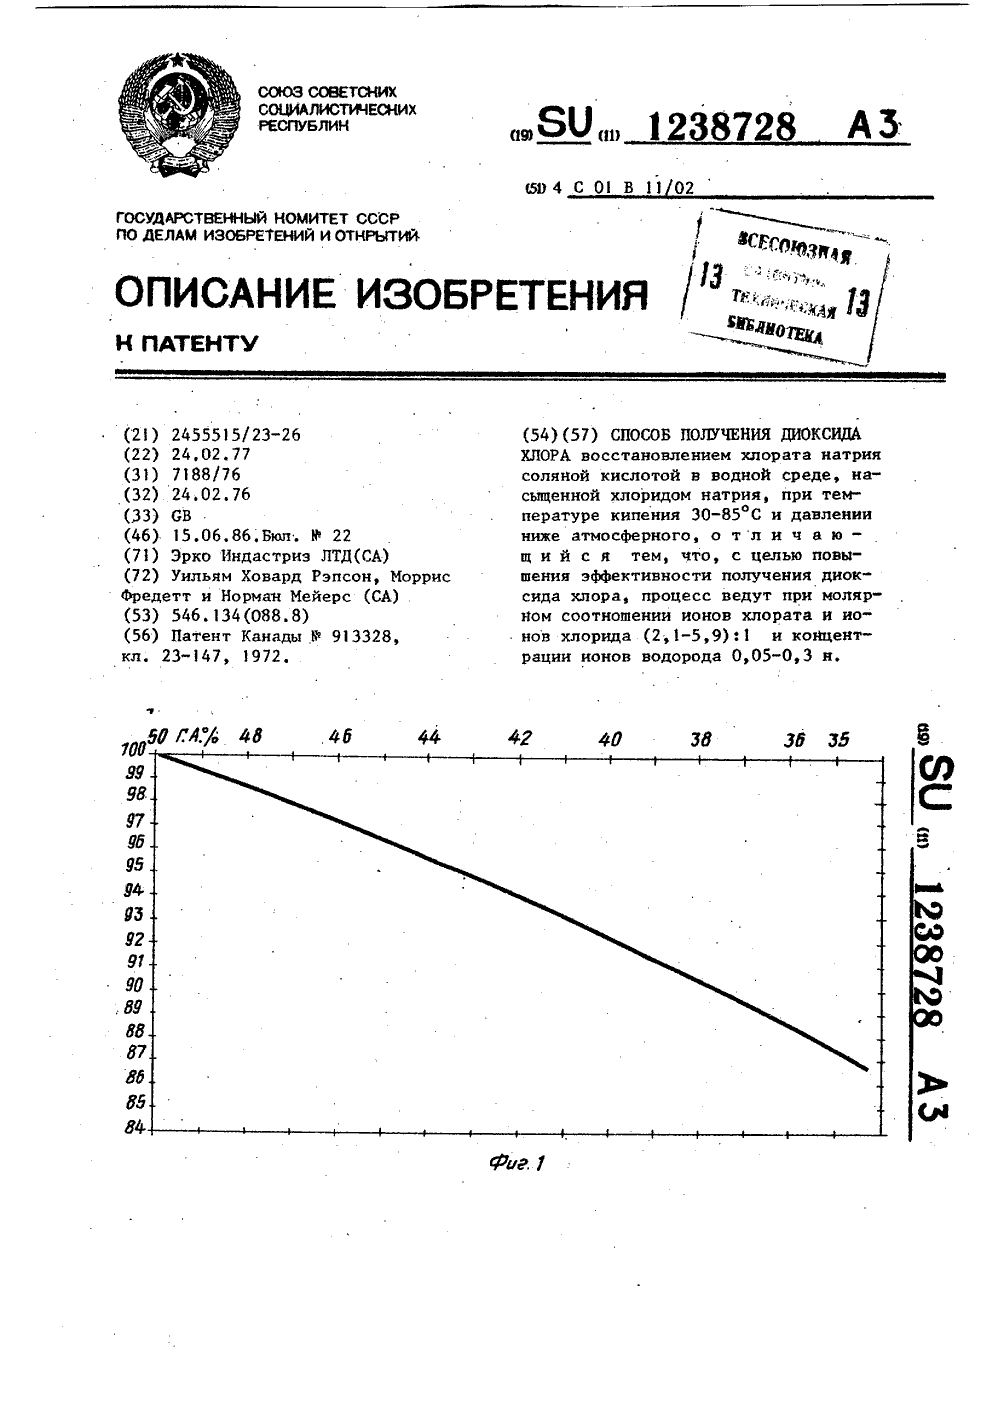 Увеличение хлора в анализе крови медицинская справка на оружие форма №046